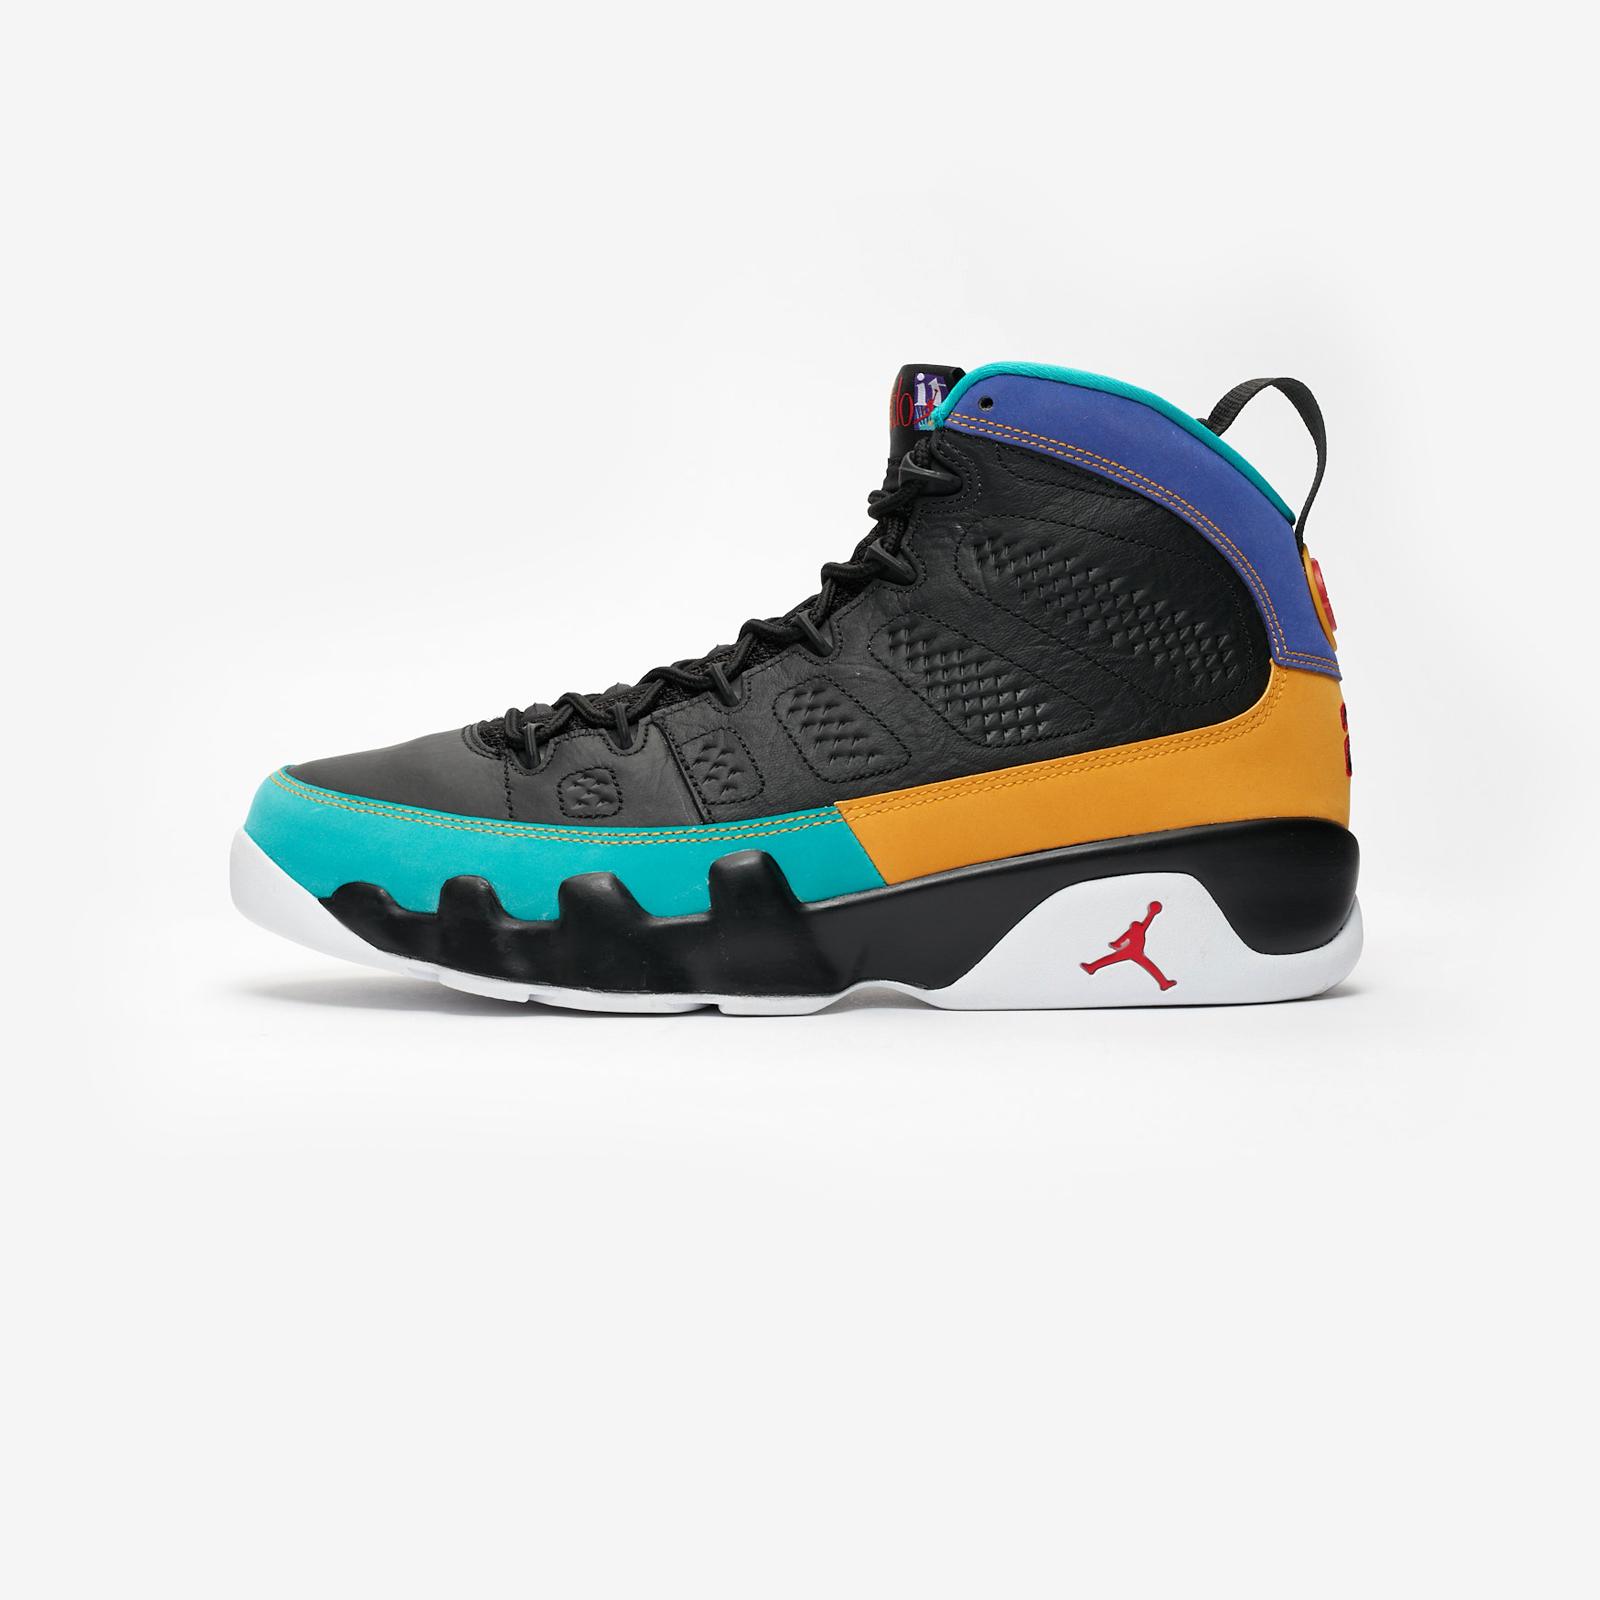 a35f4bc74d6153 Jordan Brand Air Jordan 9 Retro - 302370-065 - Sneakersnstuff ...